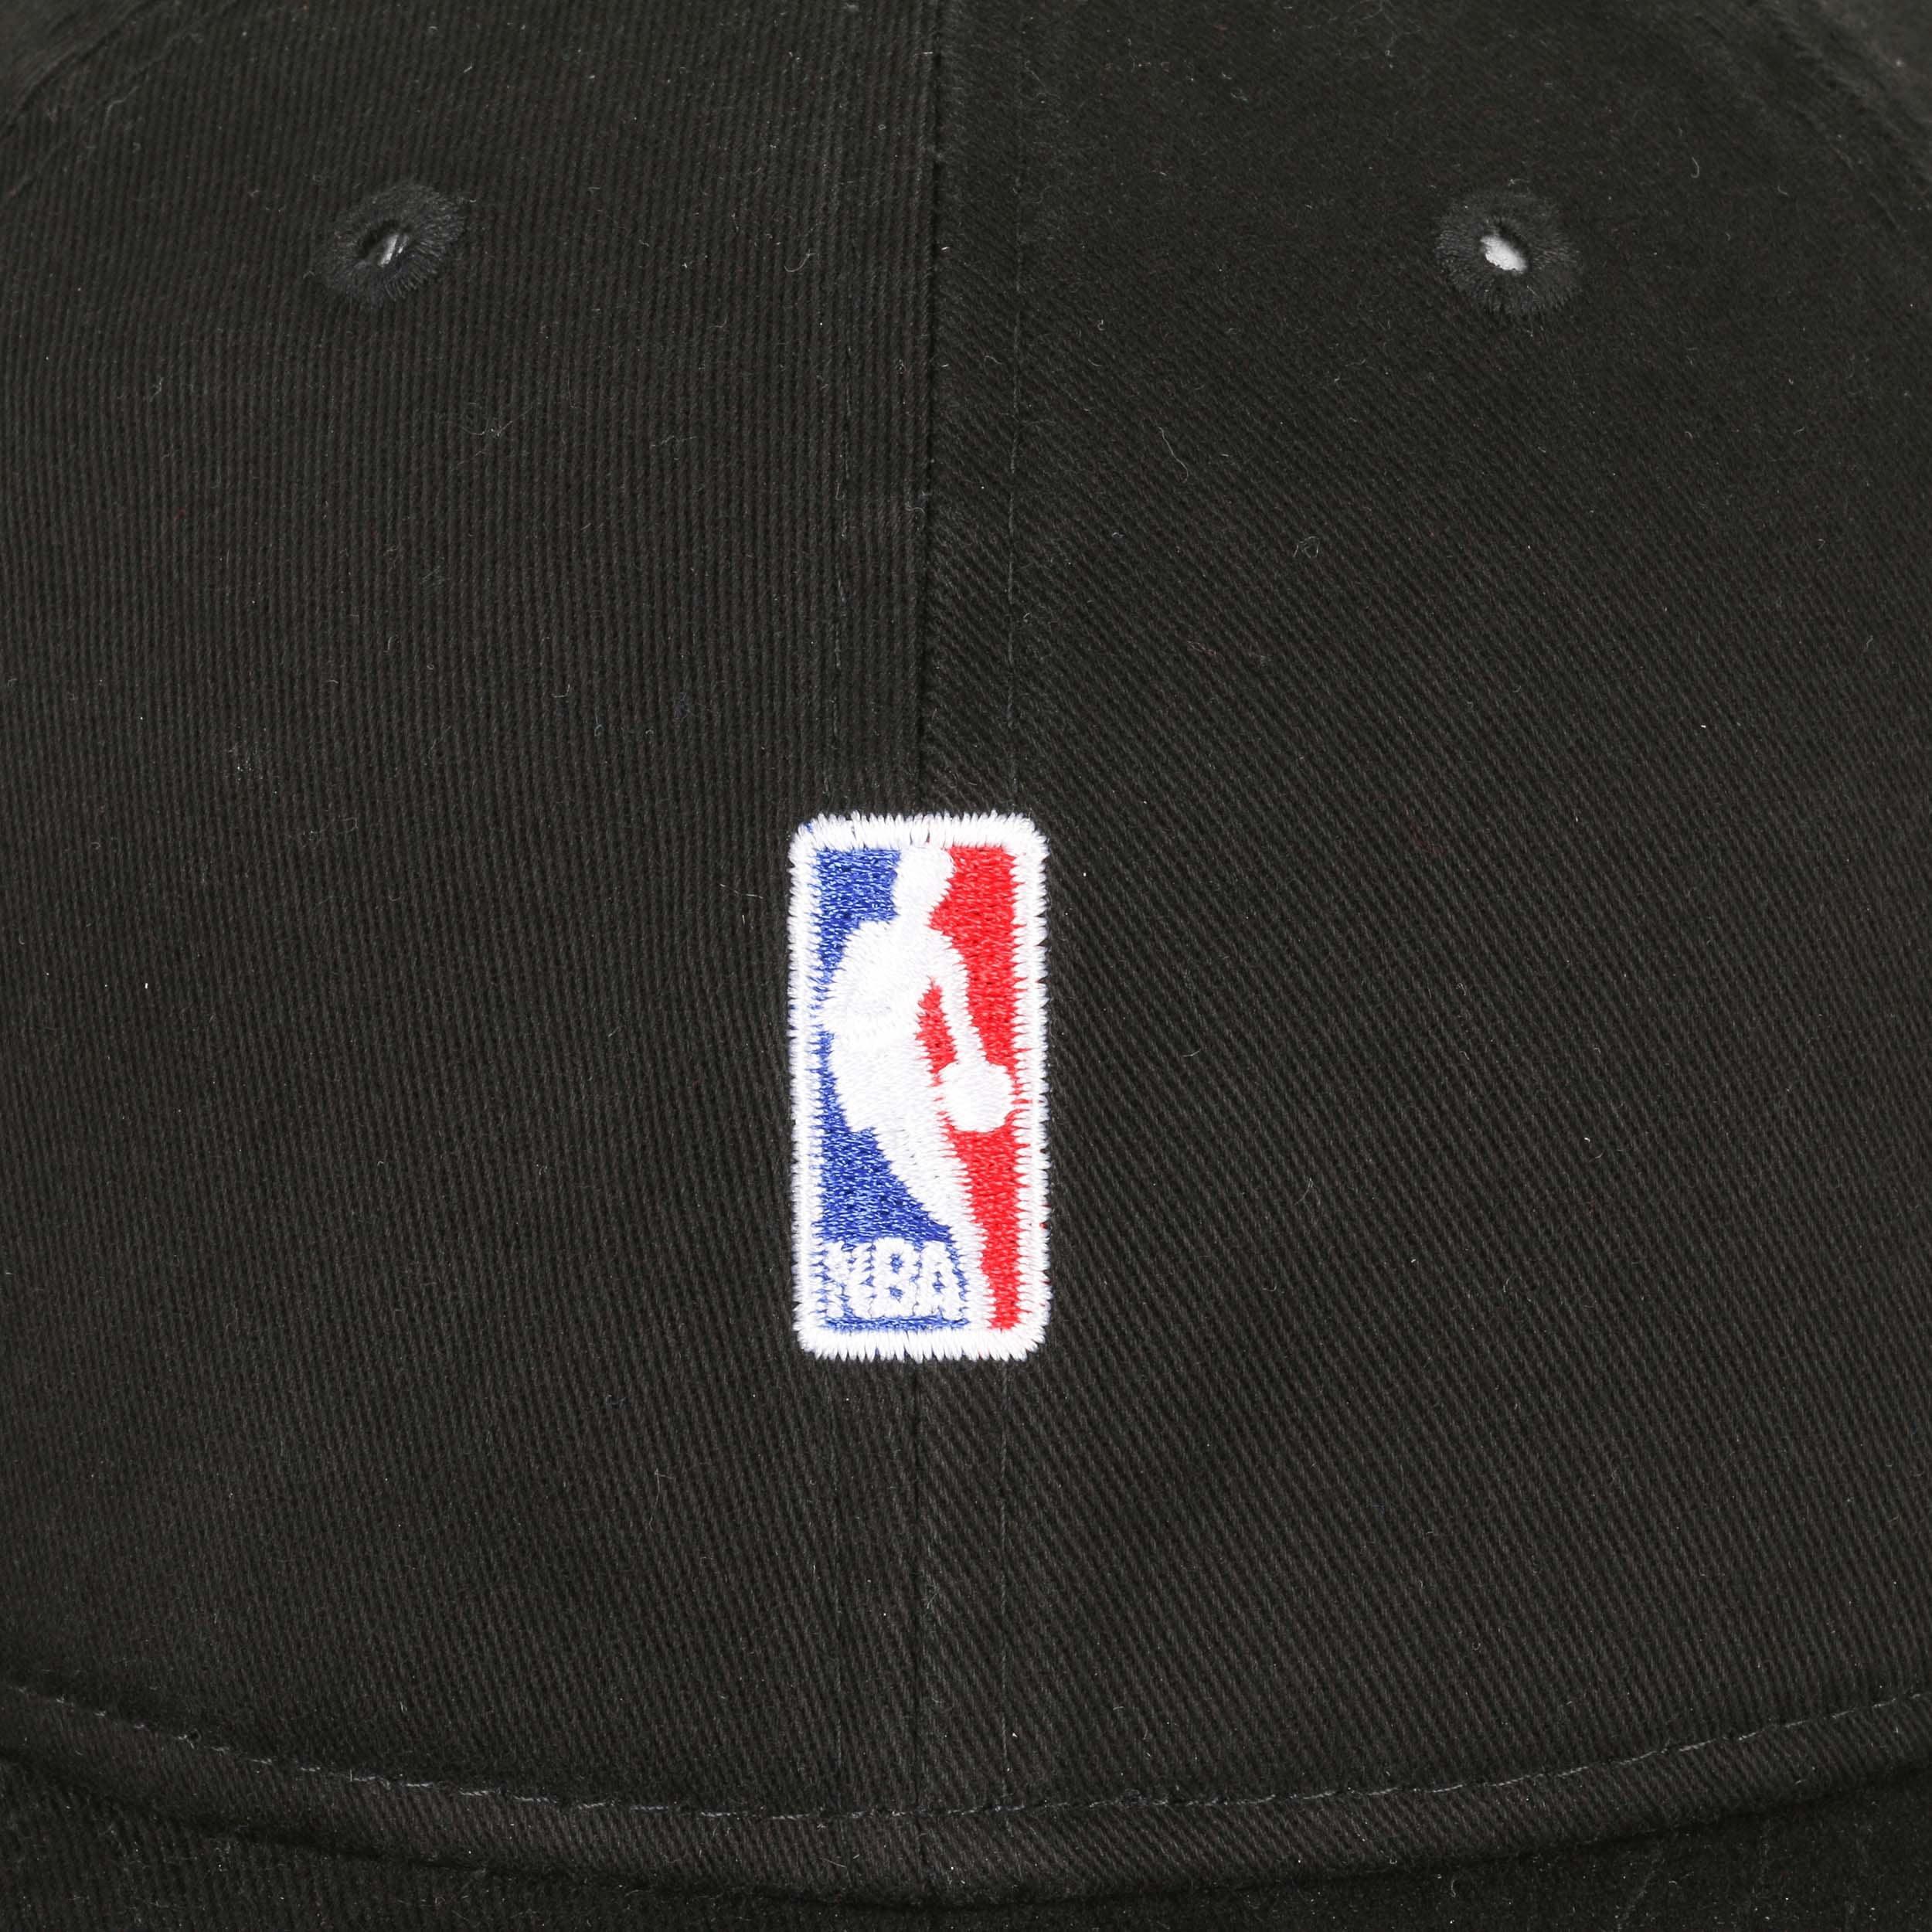 c9d9adcbc18fc4 ... 9Fifty Low Crown NBA Logo Cap by New Era - black 4 ...